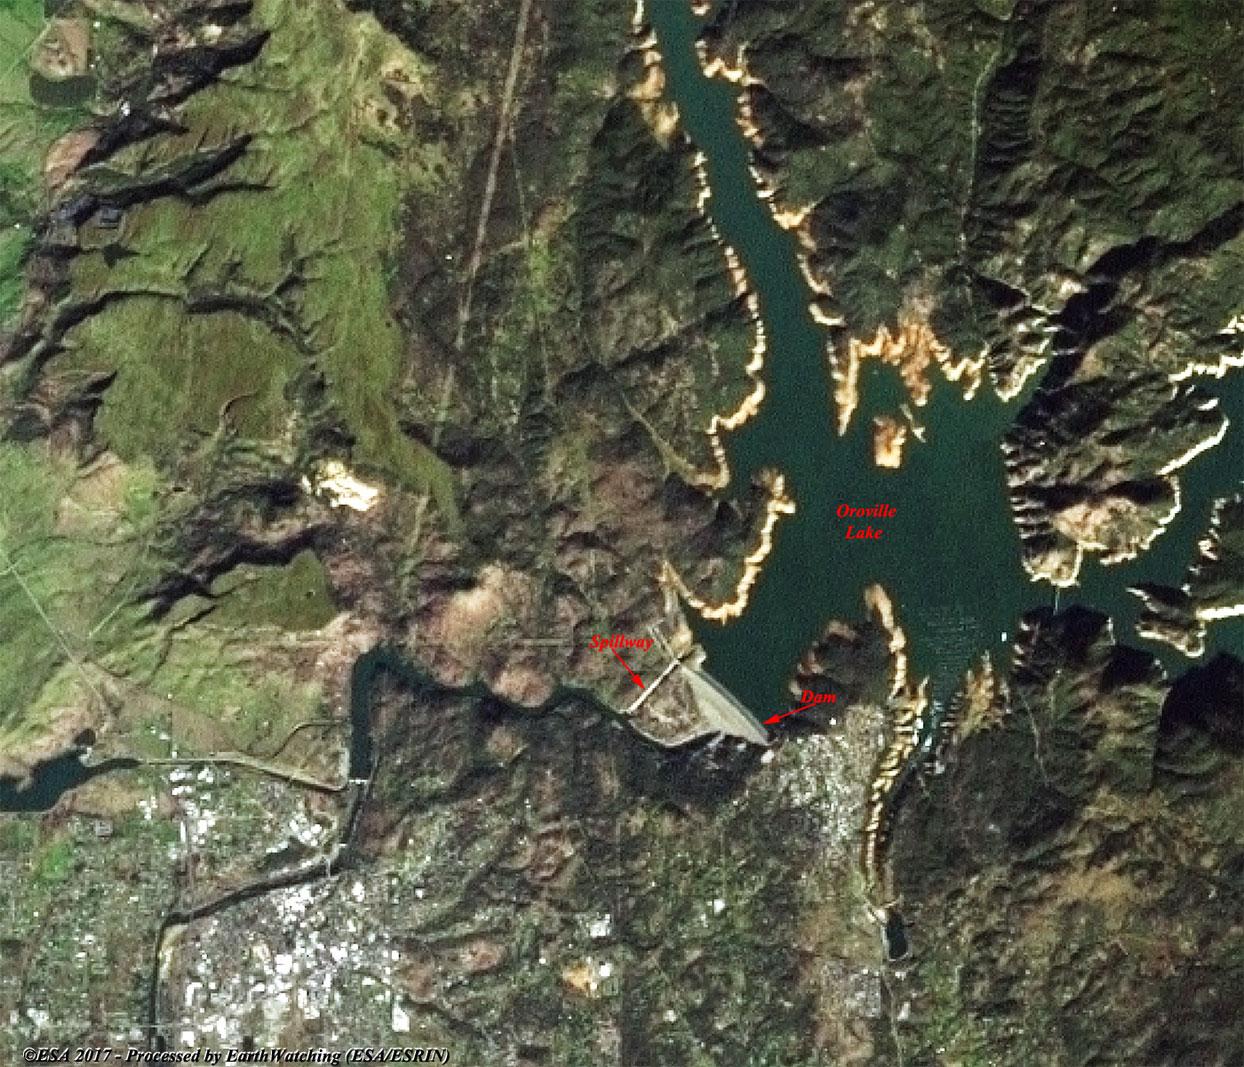 Oroville Dam crisis - Environment Hazards - Earth Watching - ESA